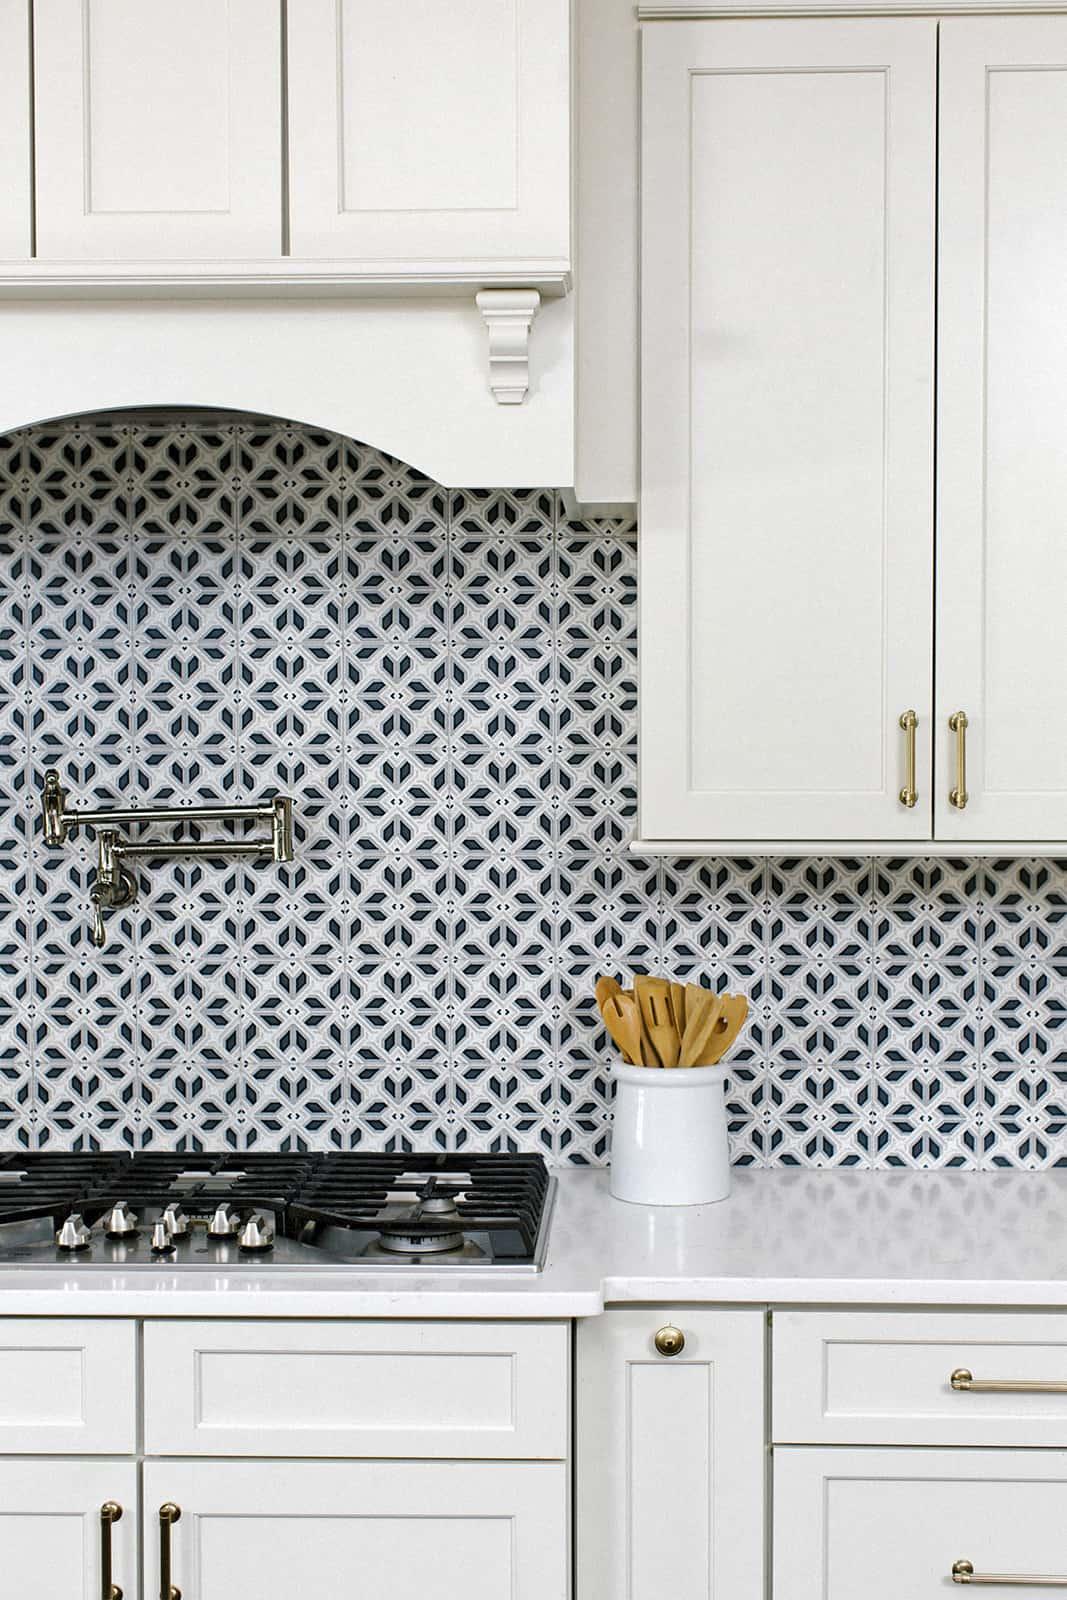 Avery Grande (Charcoal) Carrara Kitchen Backsplash